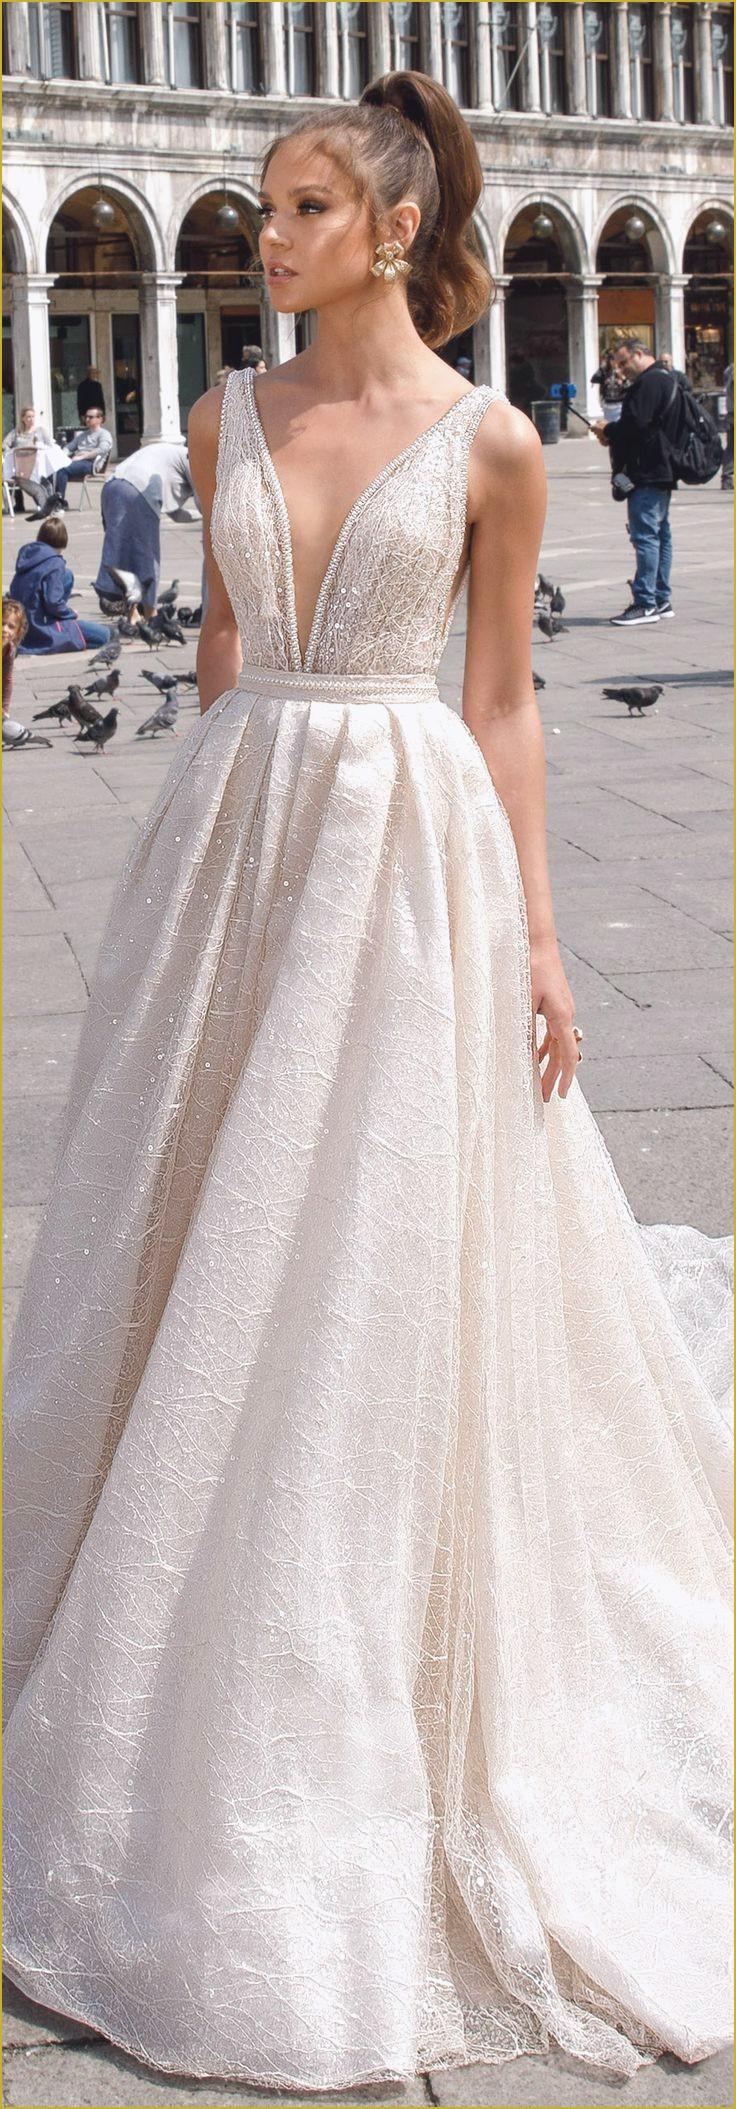 afternoon wedding dresses photo - 1